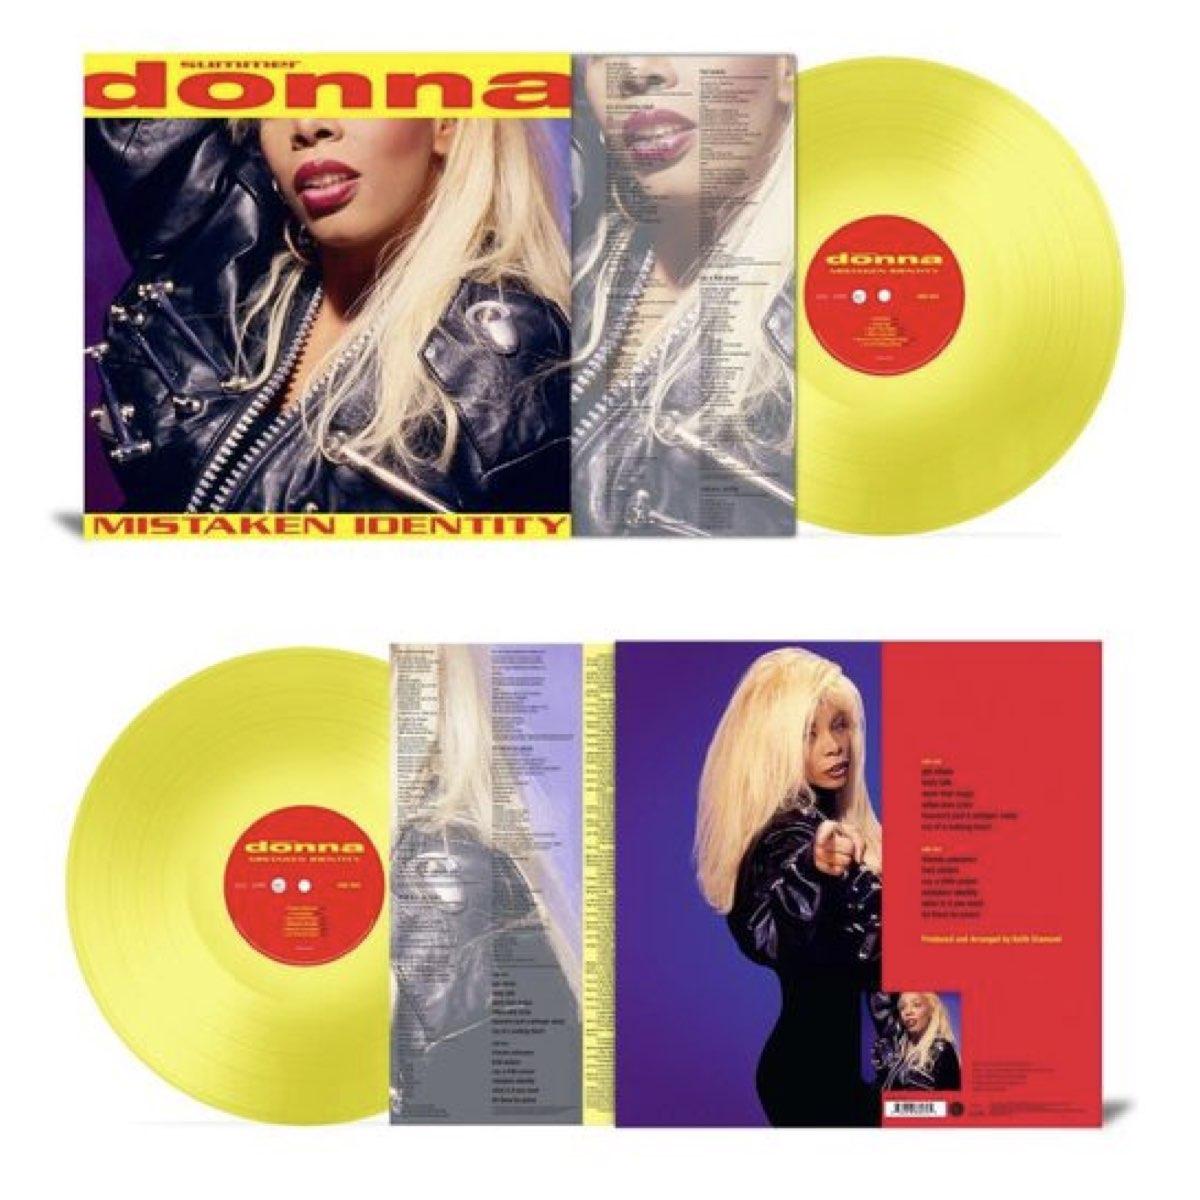 OUTLET - Donna Summer - Mistaken Identity [Translucent Yellow Vinyl] - AVARIA - LEIA A DESCRIÇÃO